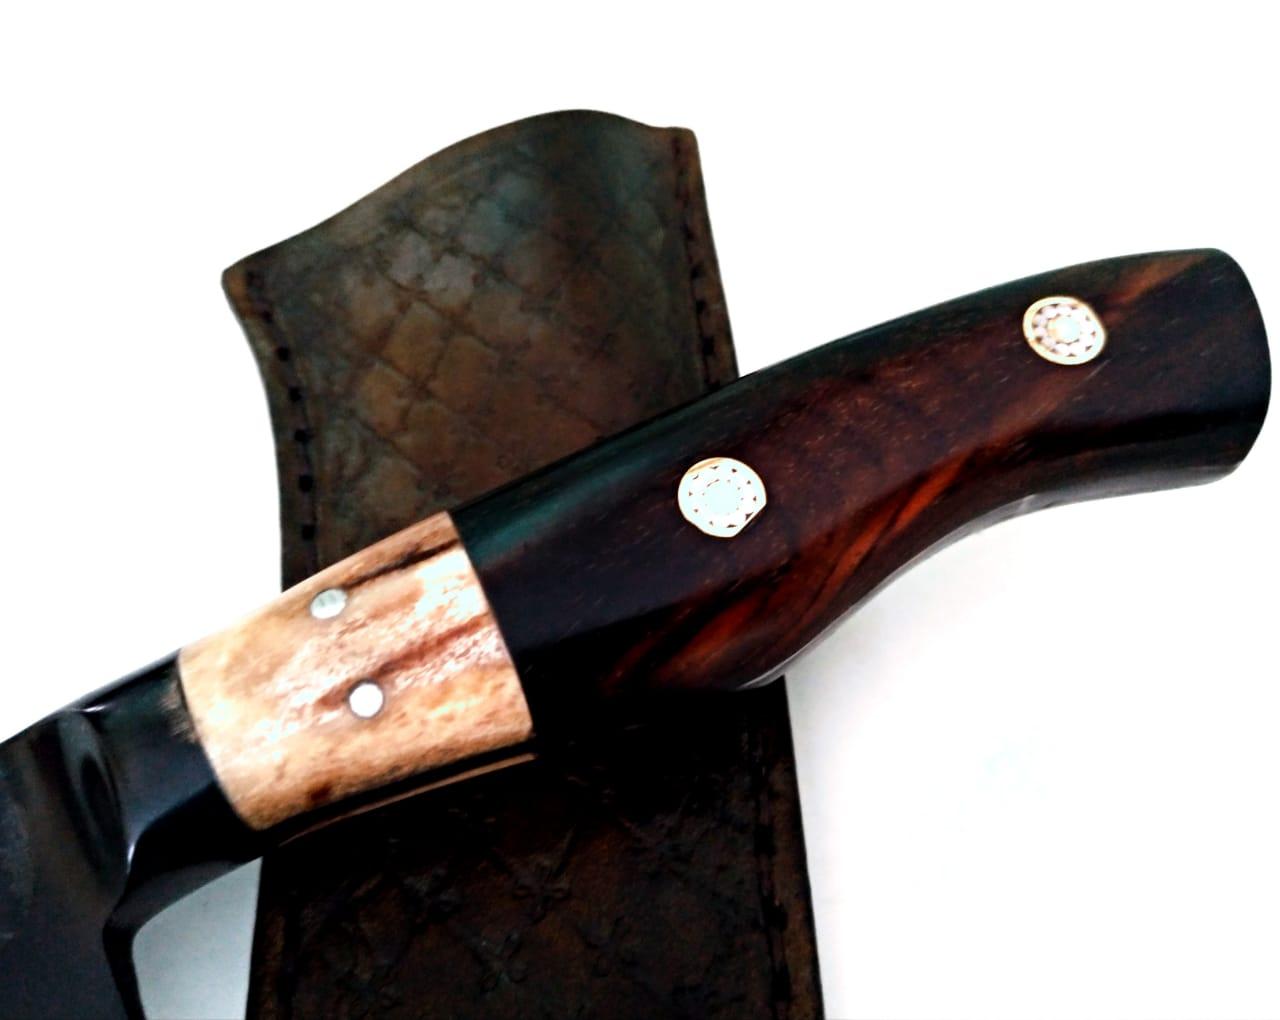 Faca artesanal forjada full tang 6 polegadas